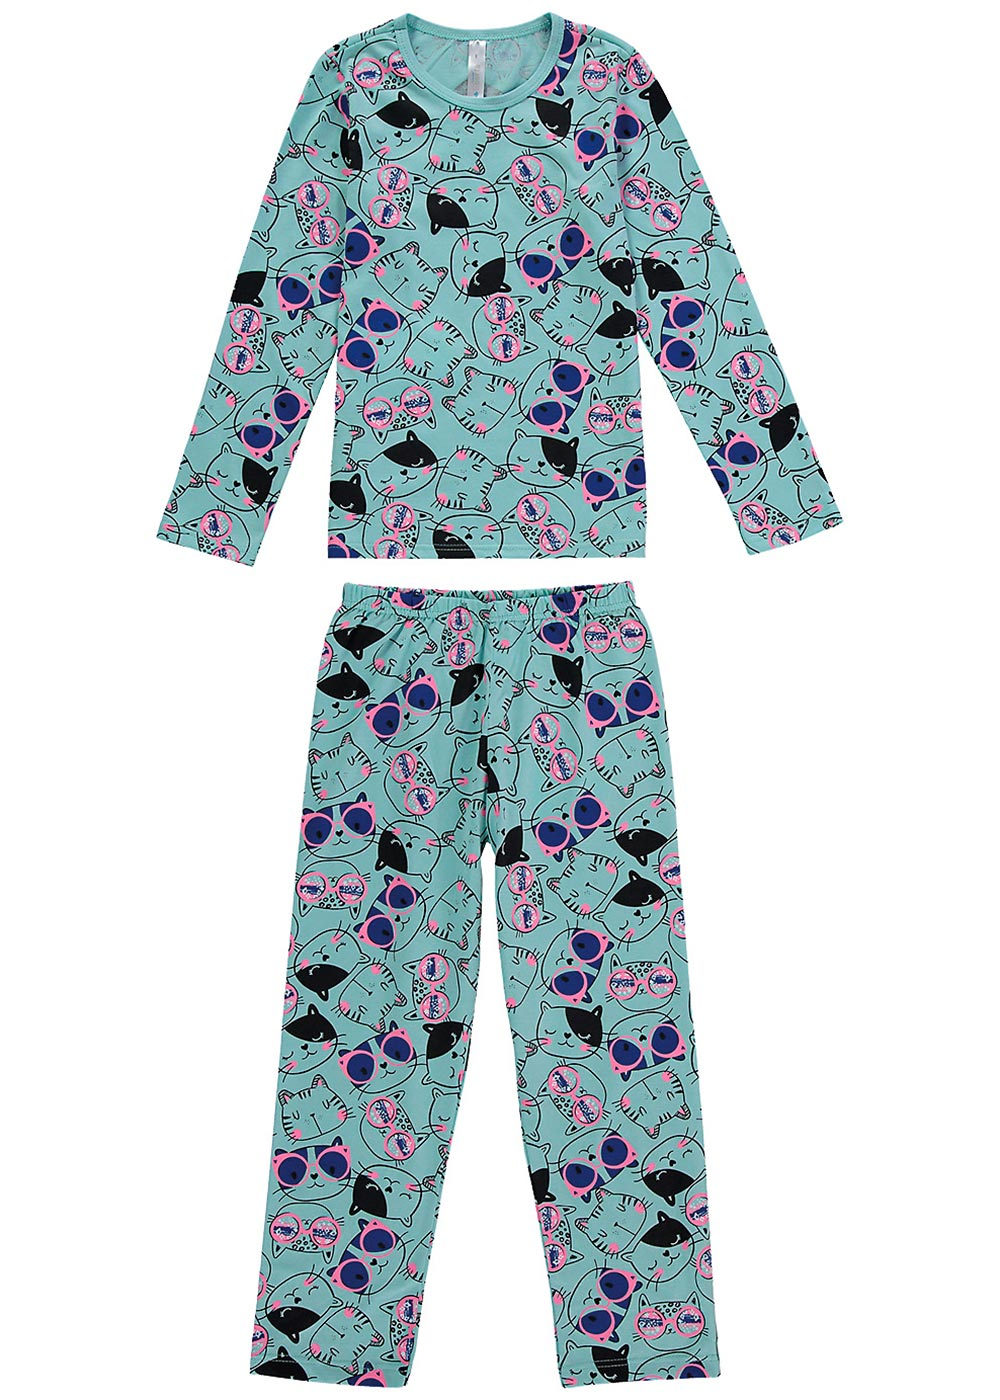 Pijama Infantil Feminino Inverno Verde Fashion Cats - Malwee